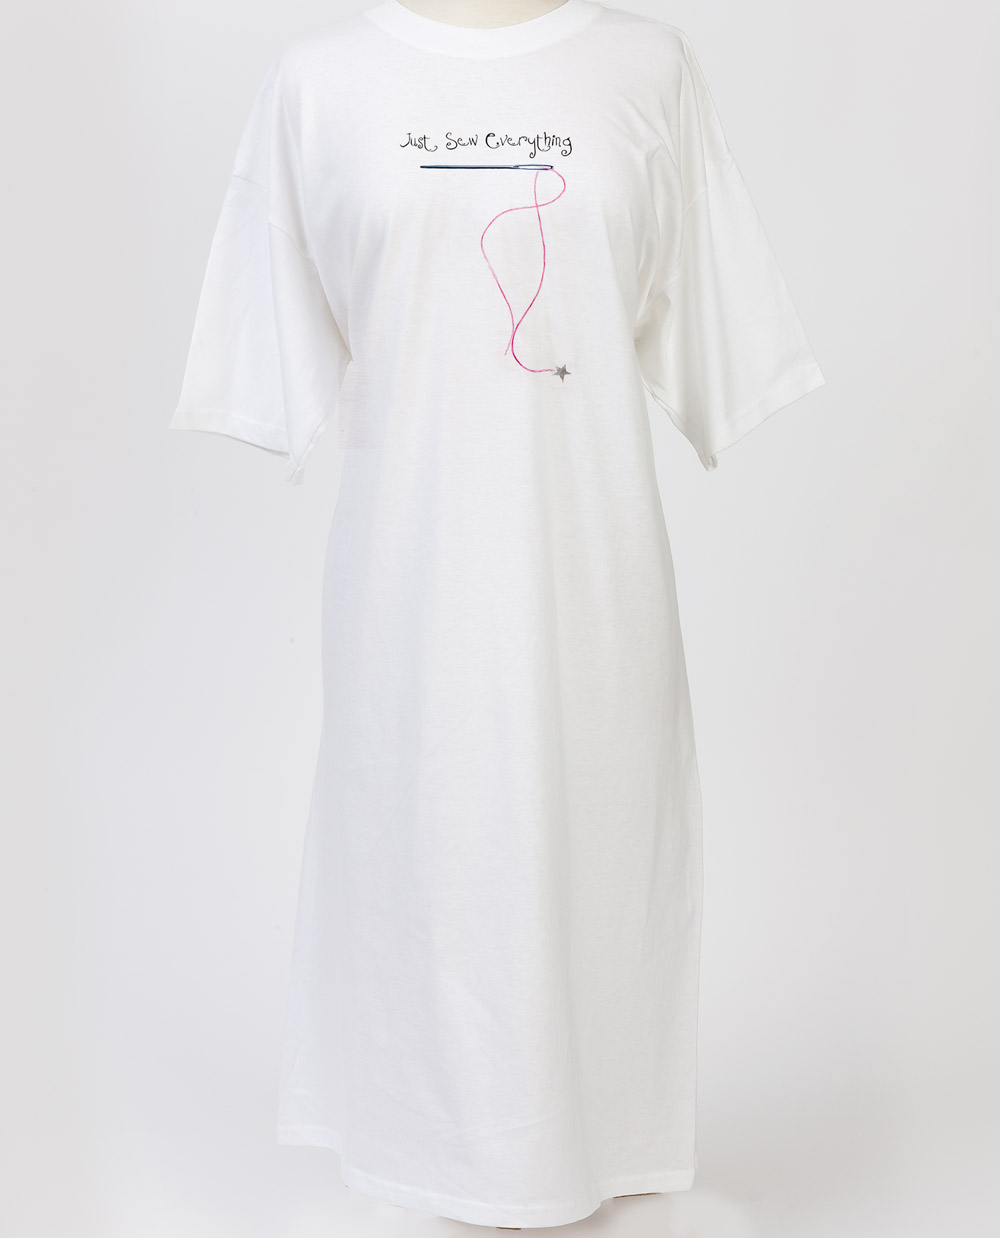 Night shirt -Just Sew Everything Design